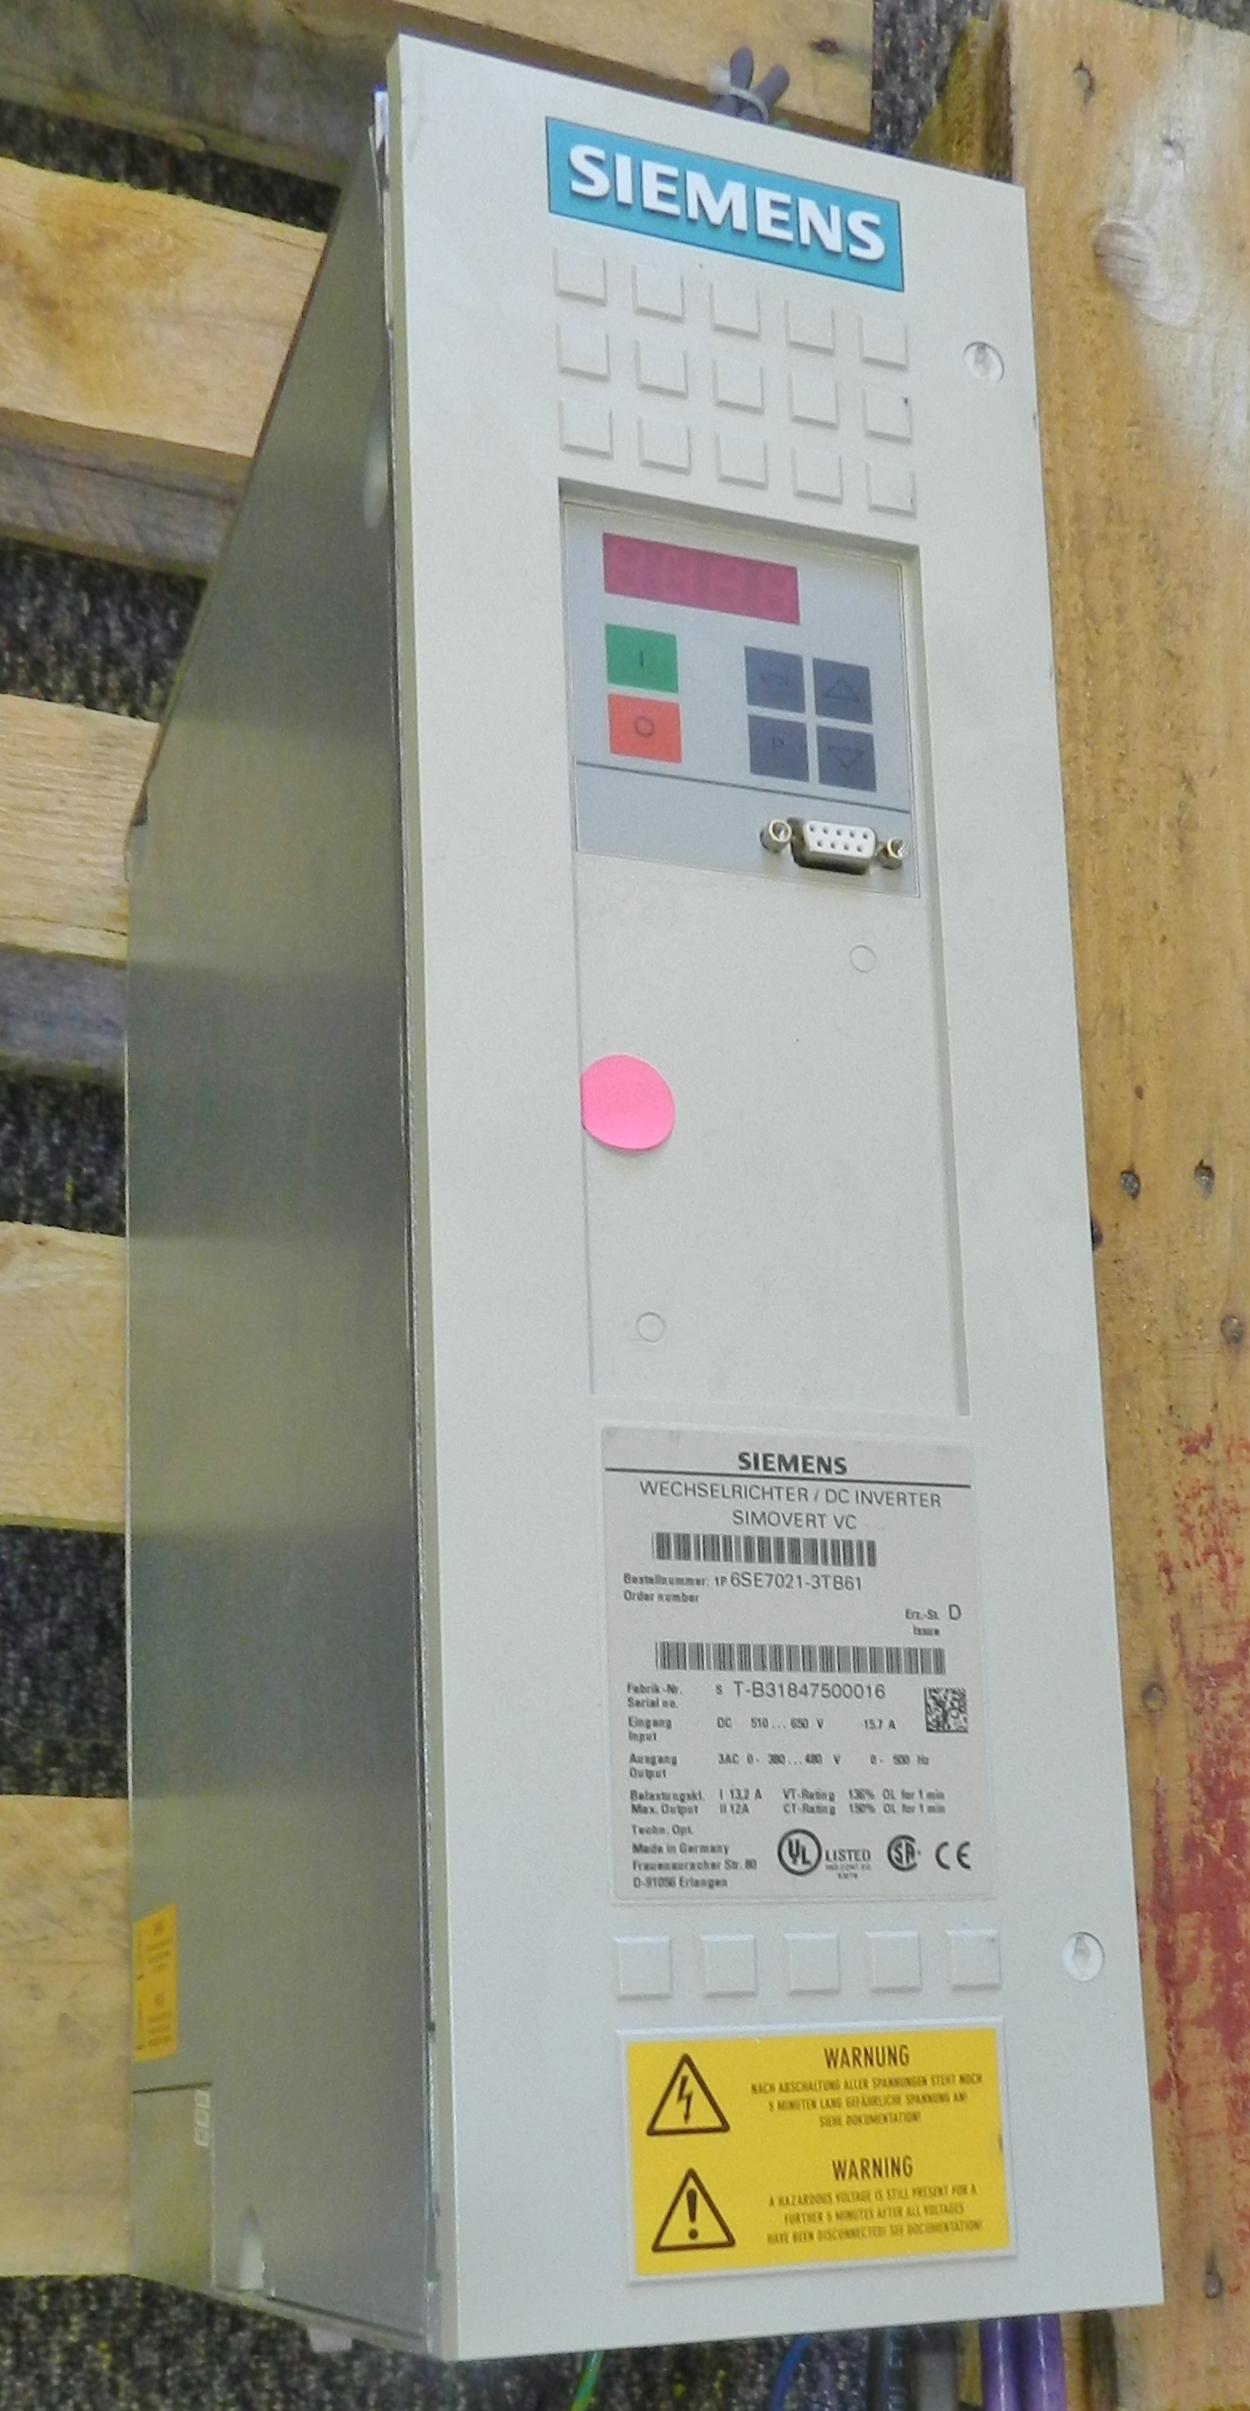 Lot 54 - Siemens DC Inverter Simovert Drive